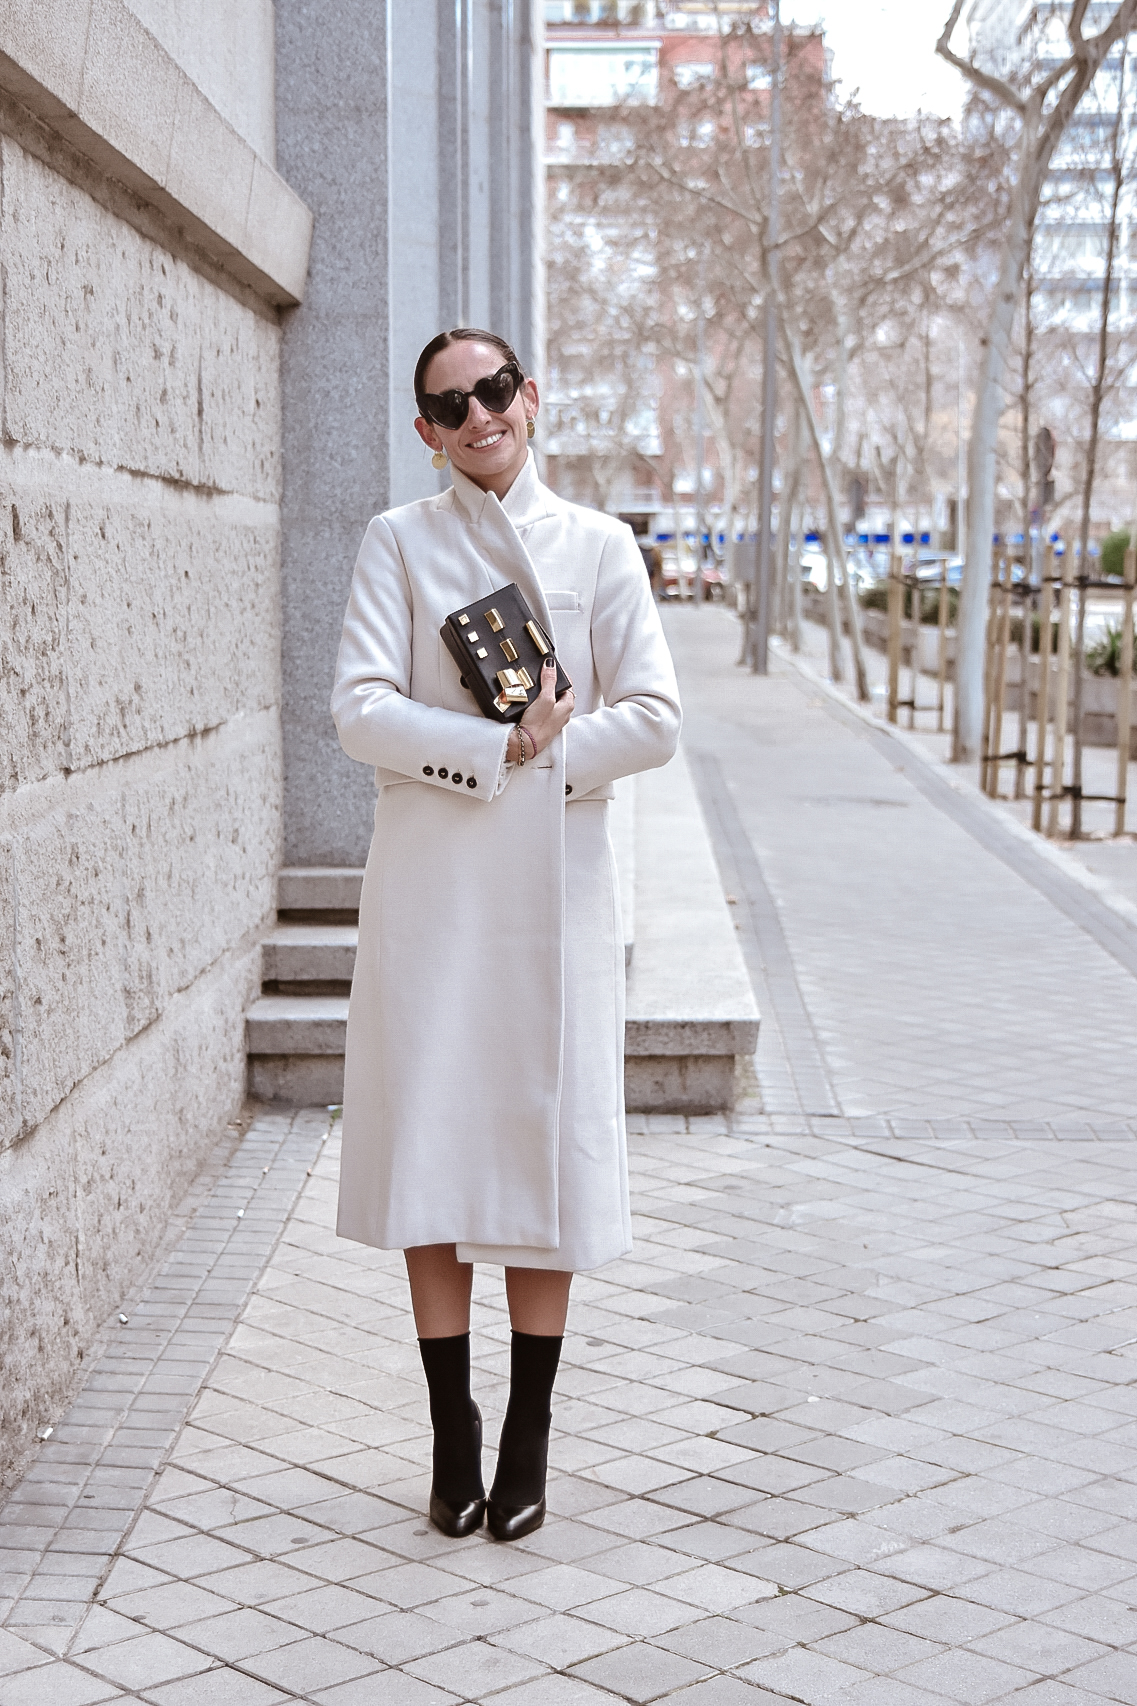 el-blog-de-silvia-look-femenino-vestido-midi-estampado-geometrico-03